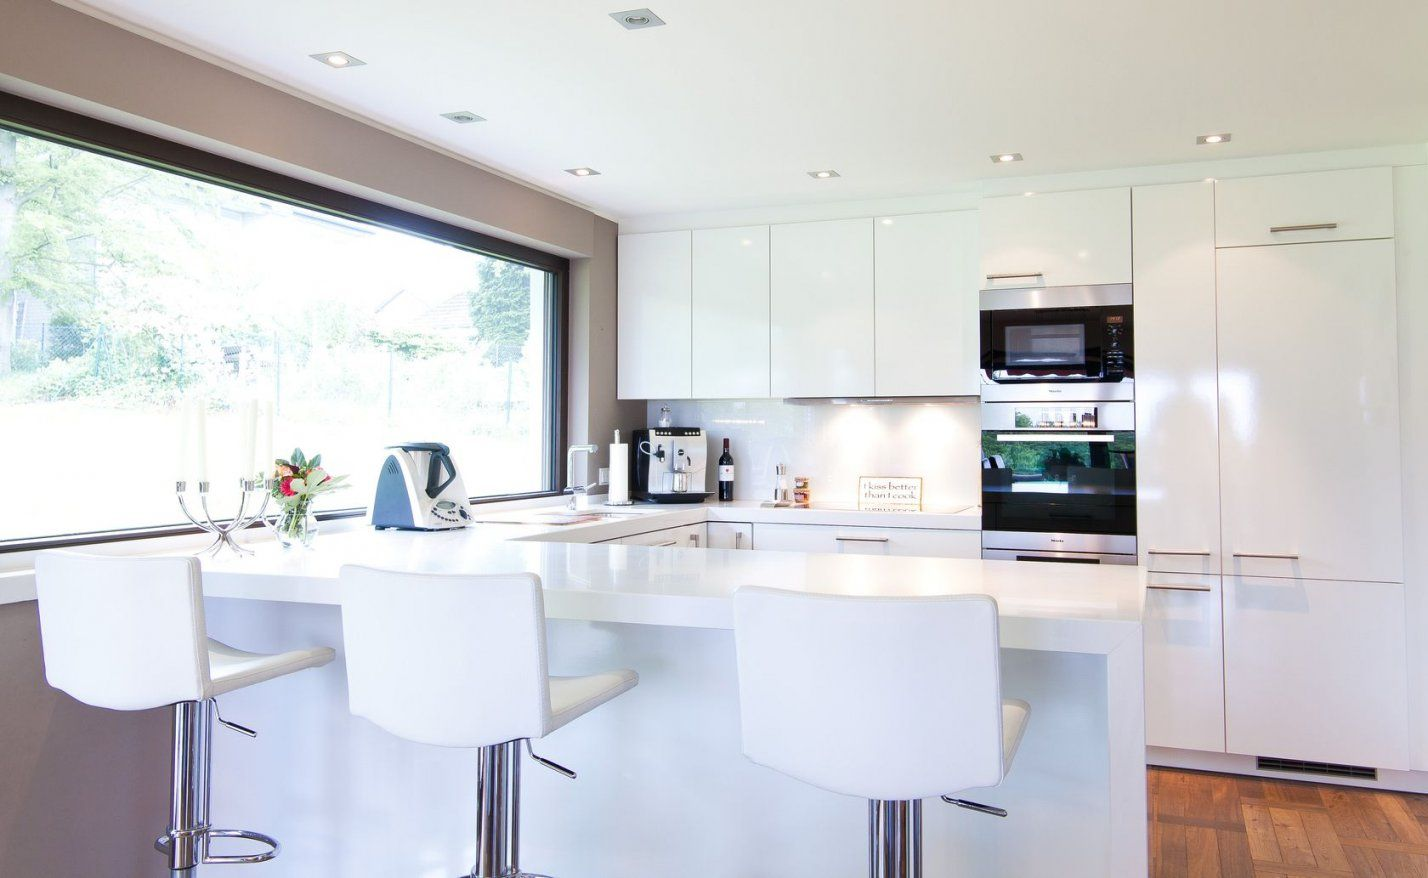 Moderne Küche Hochglanz Weiss Interessant On Modern Auf In Weiß Mit von Moderne Küche Hochglanz Weiss Bild